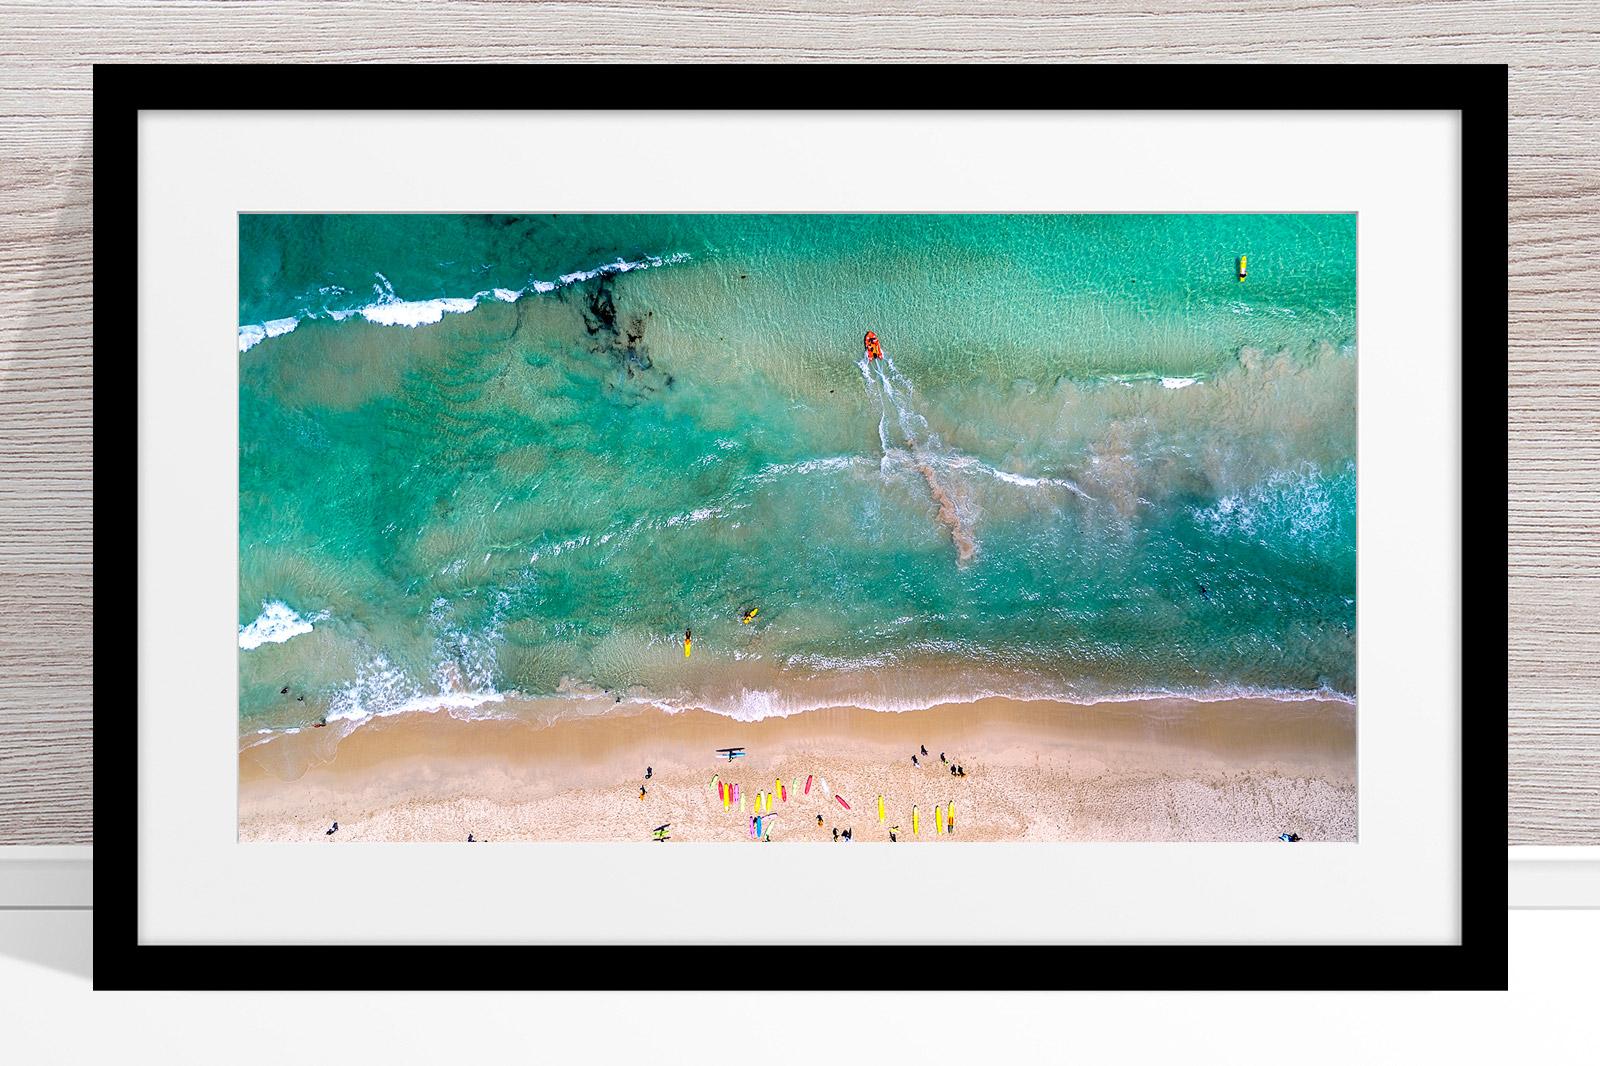 094 - Jason Mazur - 'Trigg Beach Surf Carnival' Black Frame